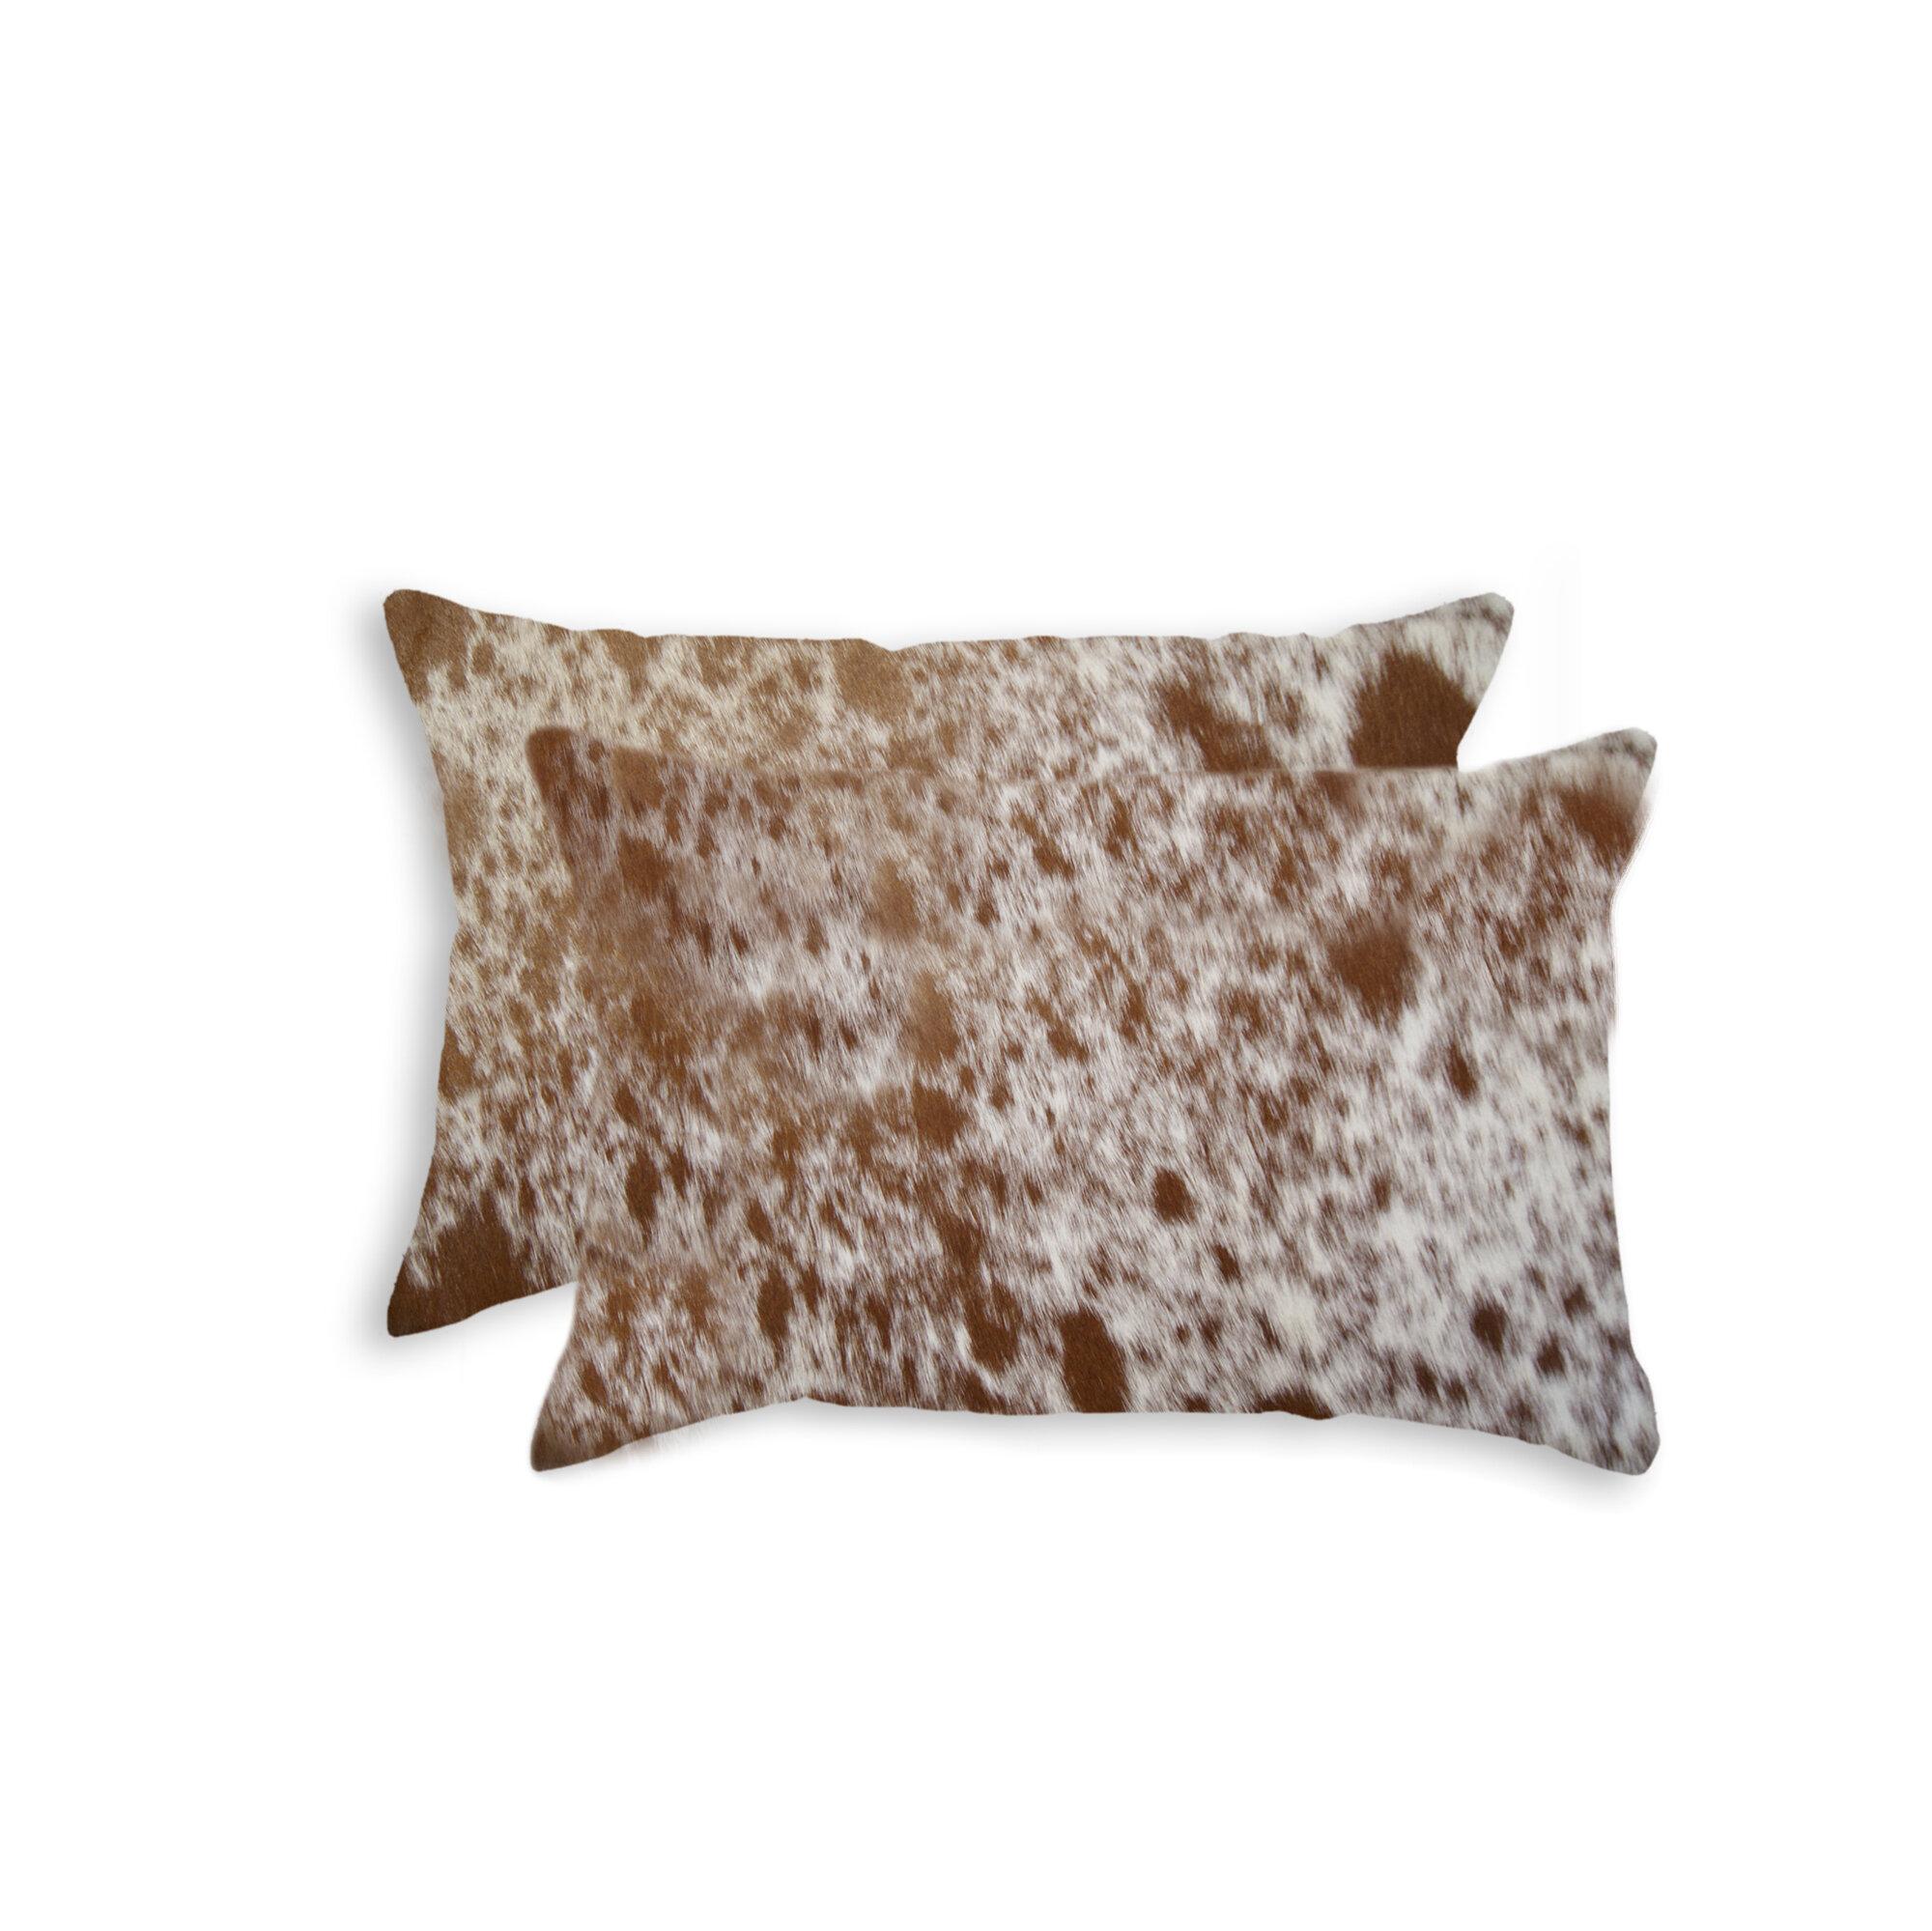 Bloomsbury Market Graham Rectangular Leather Pillow Cover And Insert Wayfair